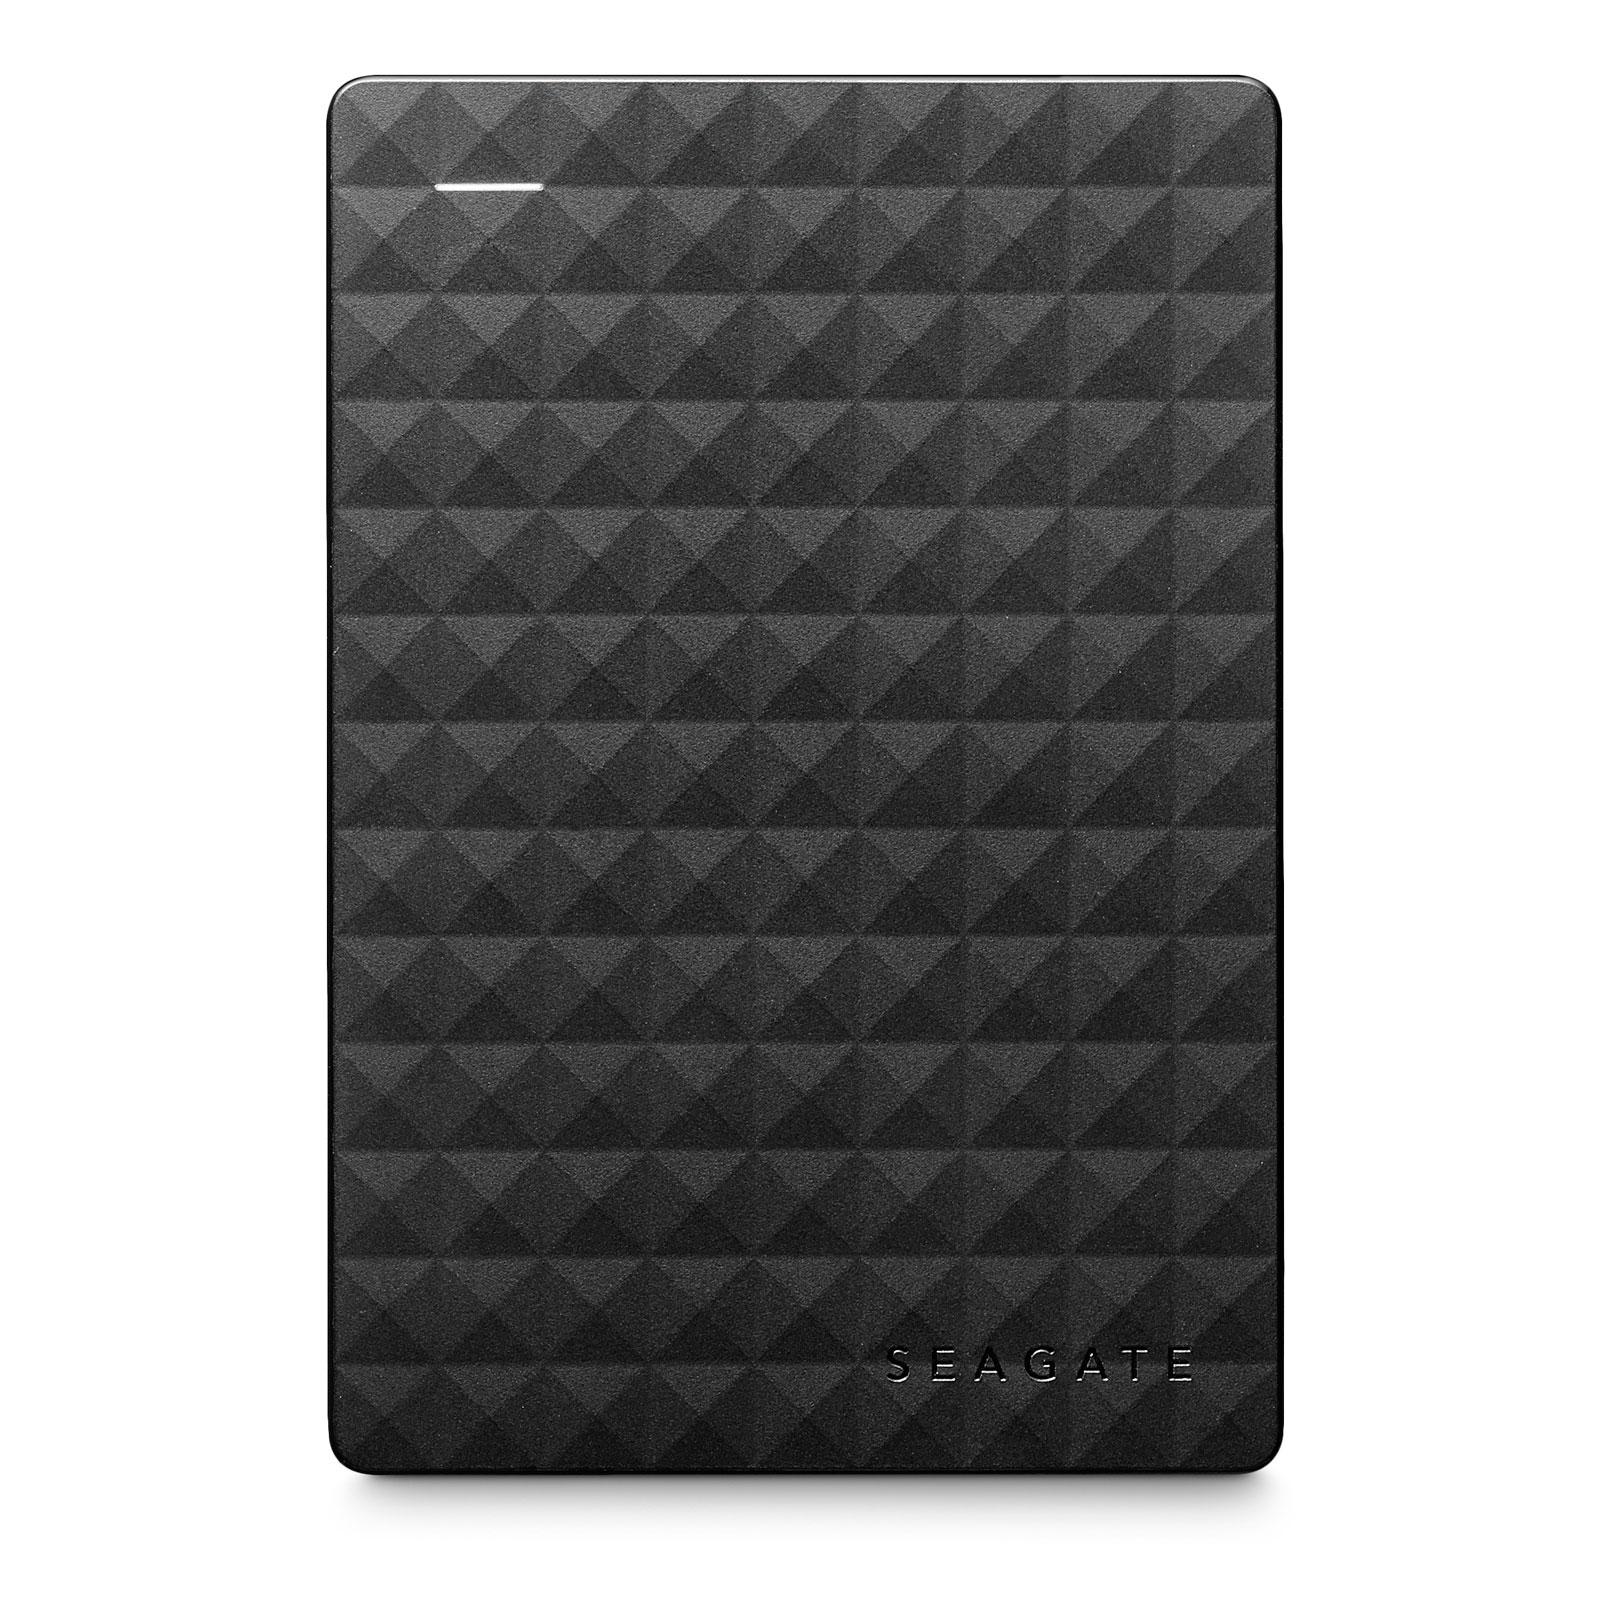 seagate portable expansion 2 to disque dur externe. Black Bedroom Furniture Sets. Home Design Ideas